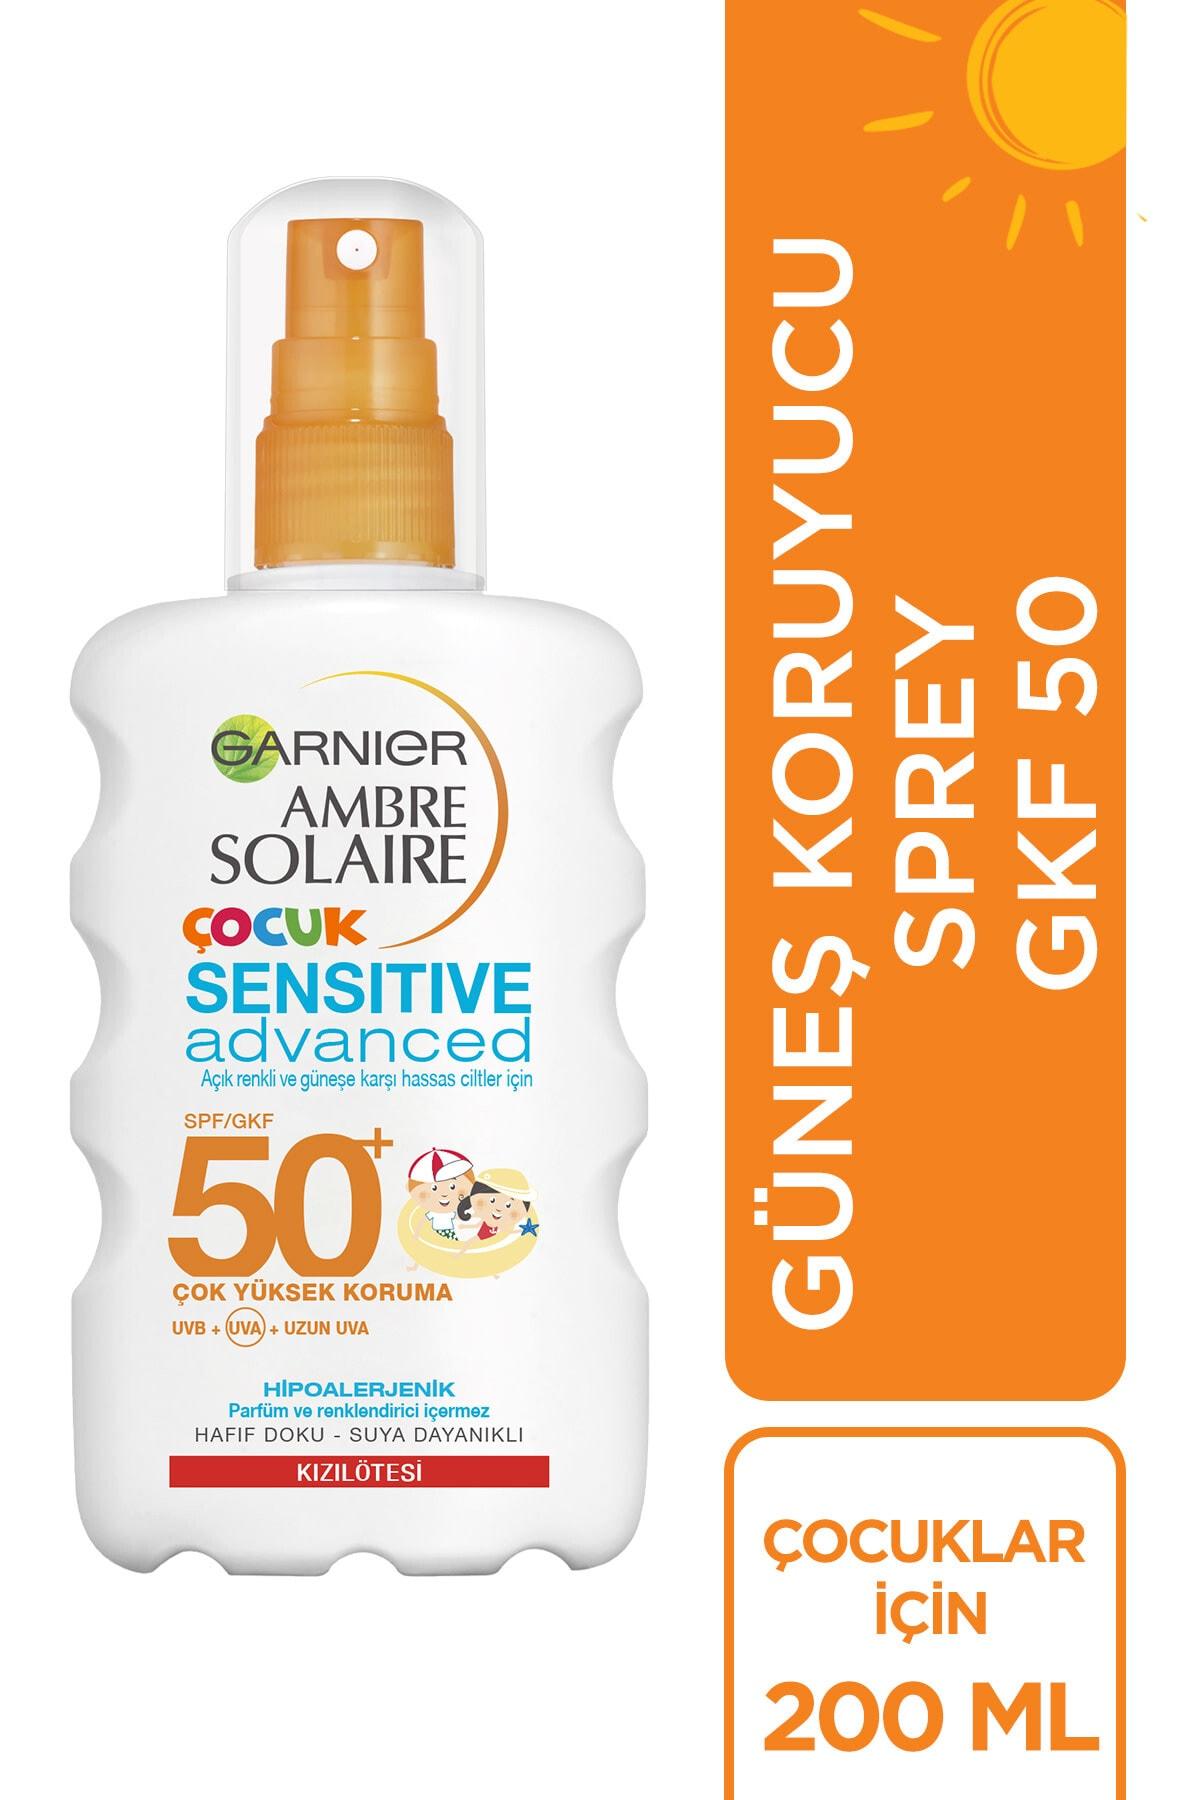 Garnier Ambre Solaire Sensitive Advanced Çocuk Sprey Gkf50+ 200ml 1